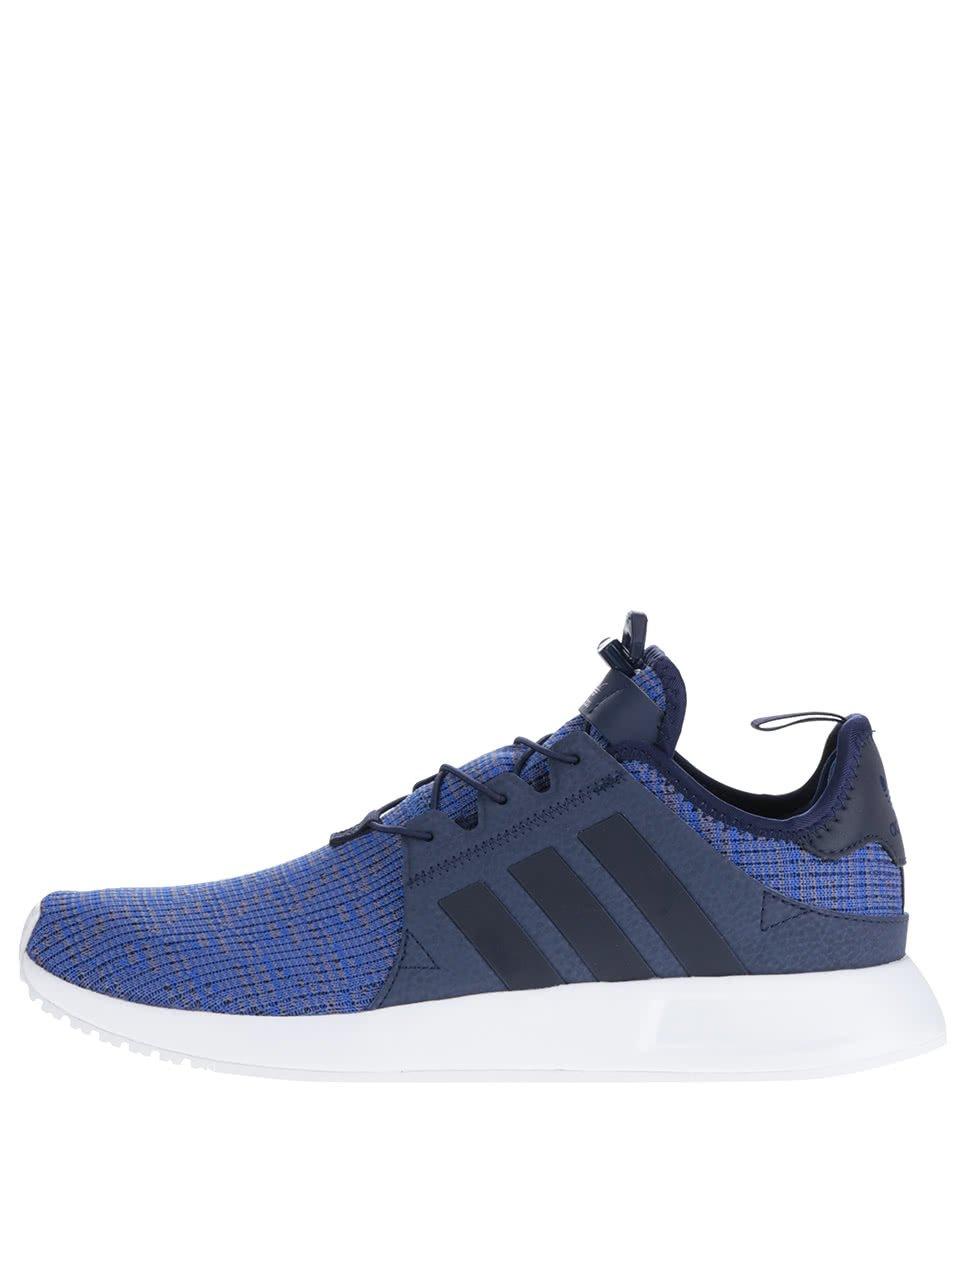 Modré pánské tenisky adidas Originals X